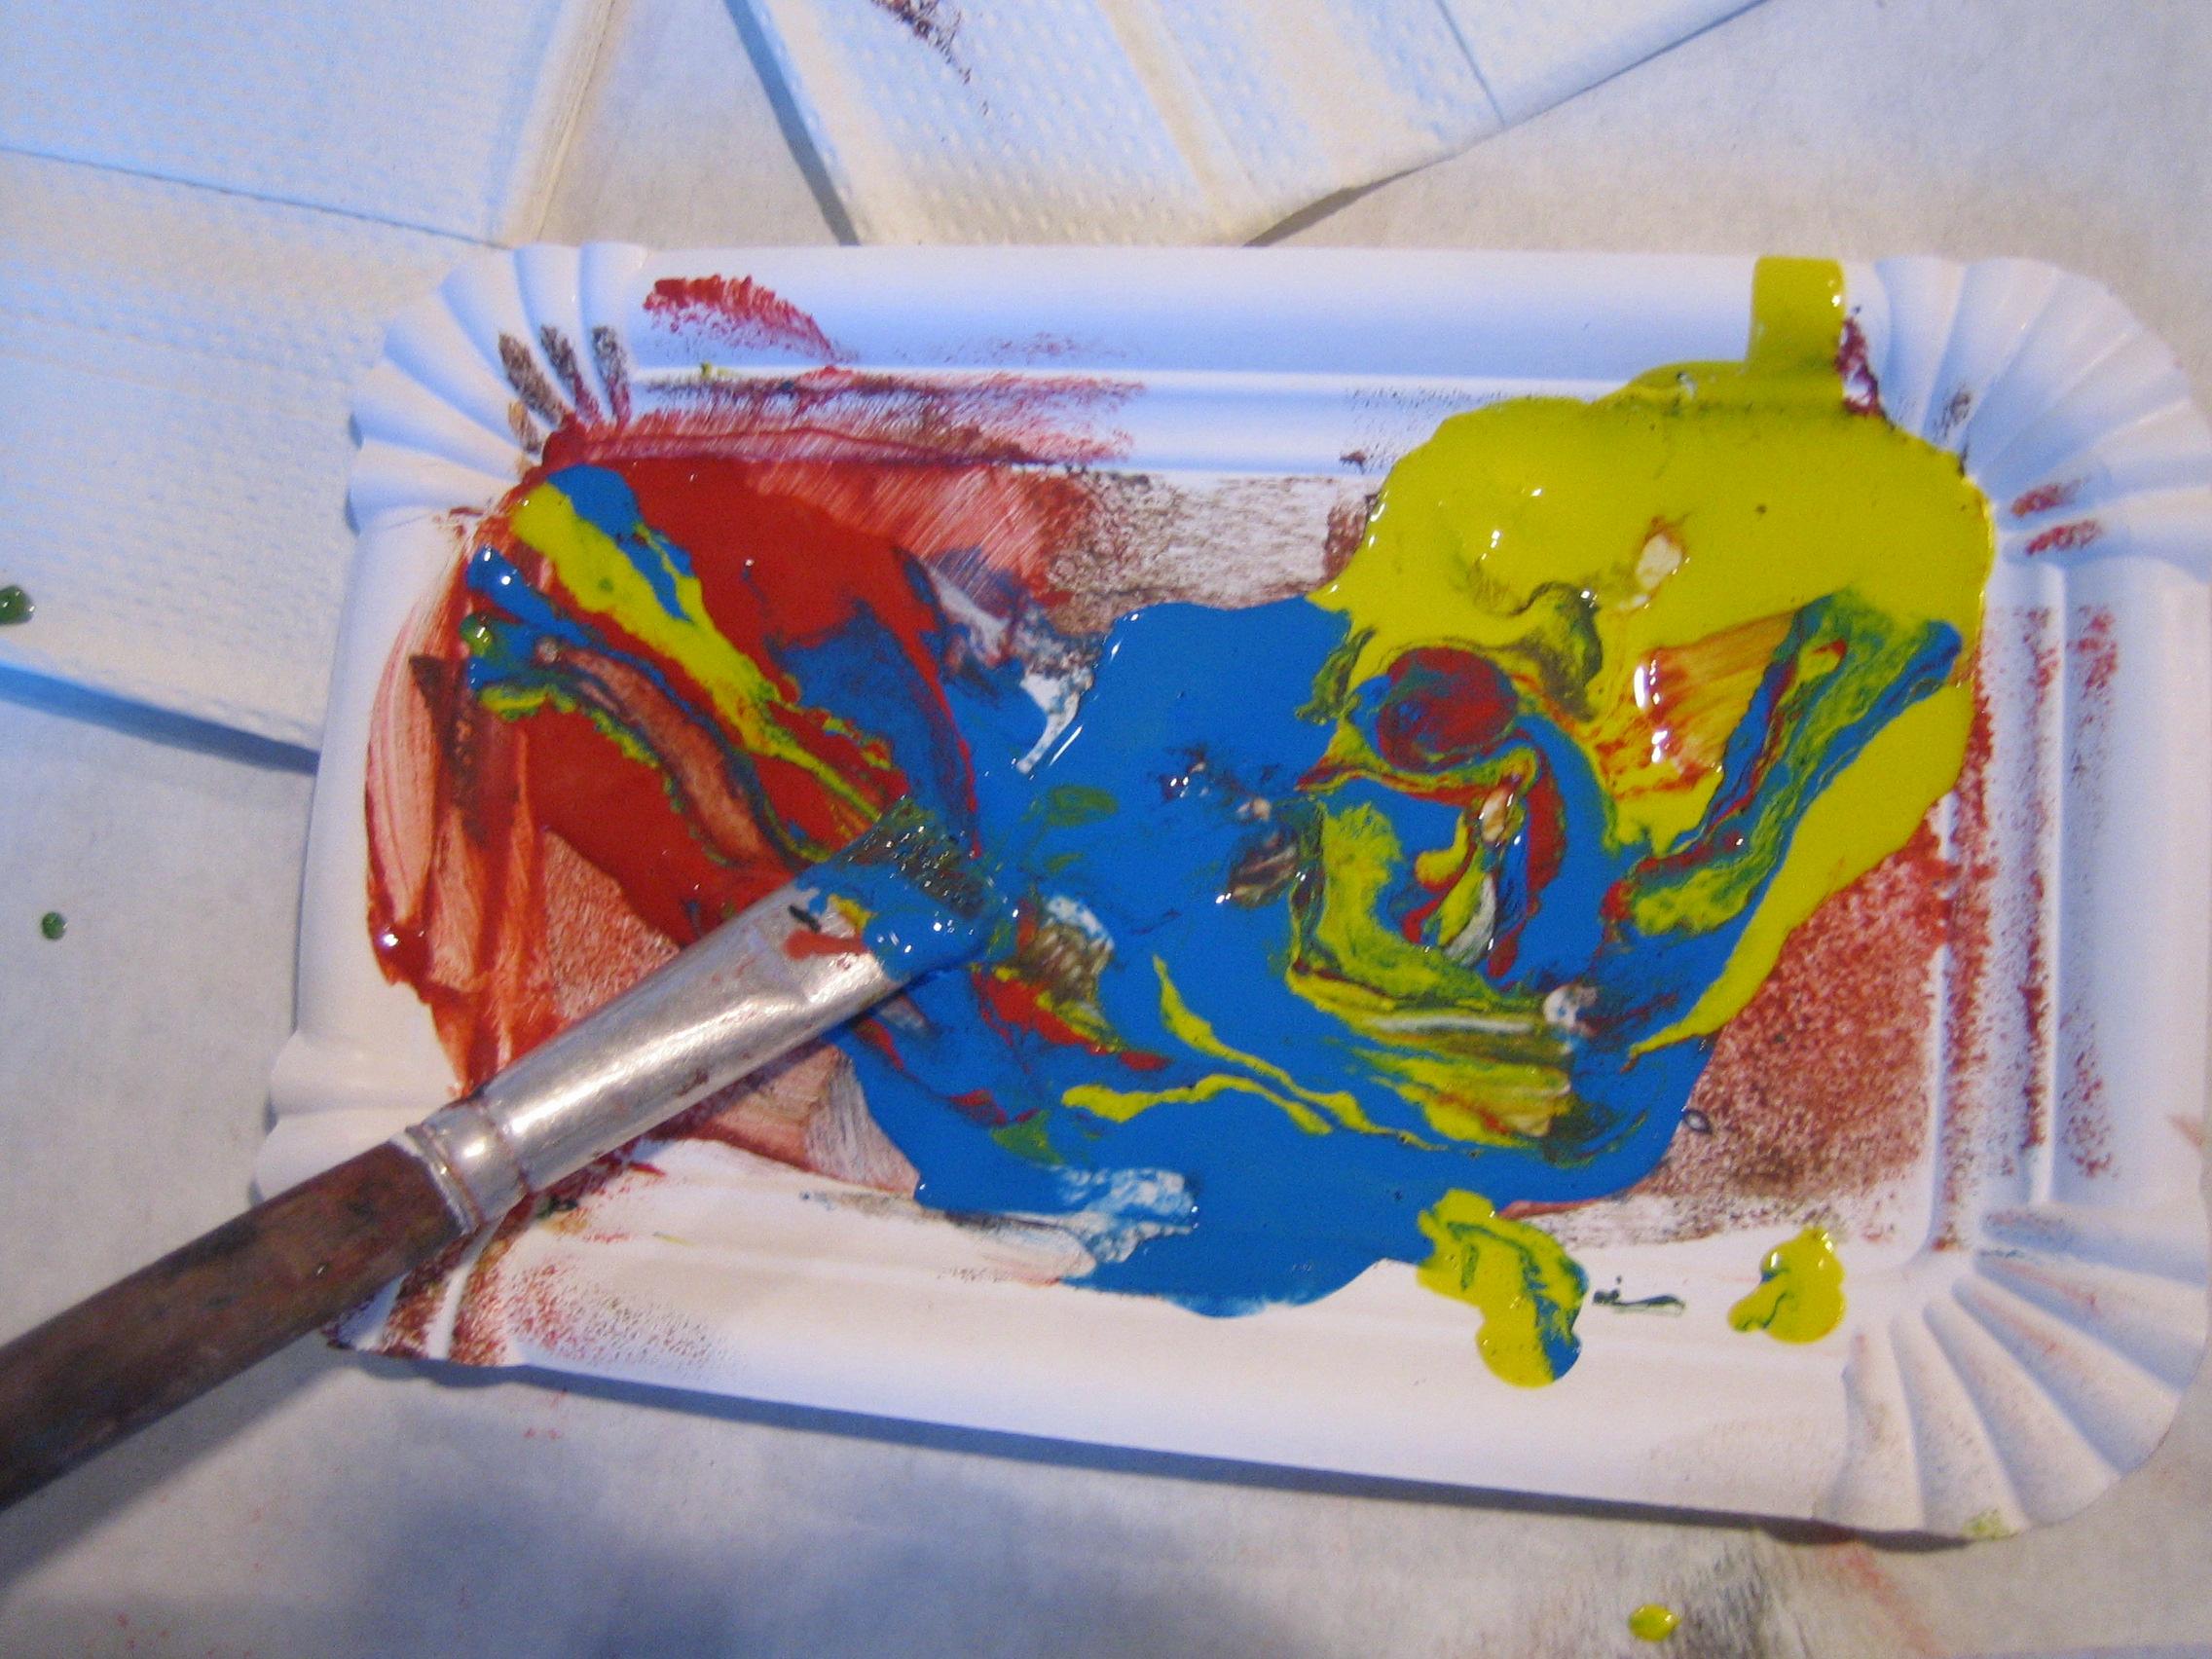 Veranstaltung Kreativ-Kids-Club im DomQuartier Salzburg